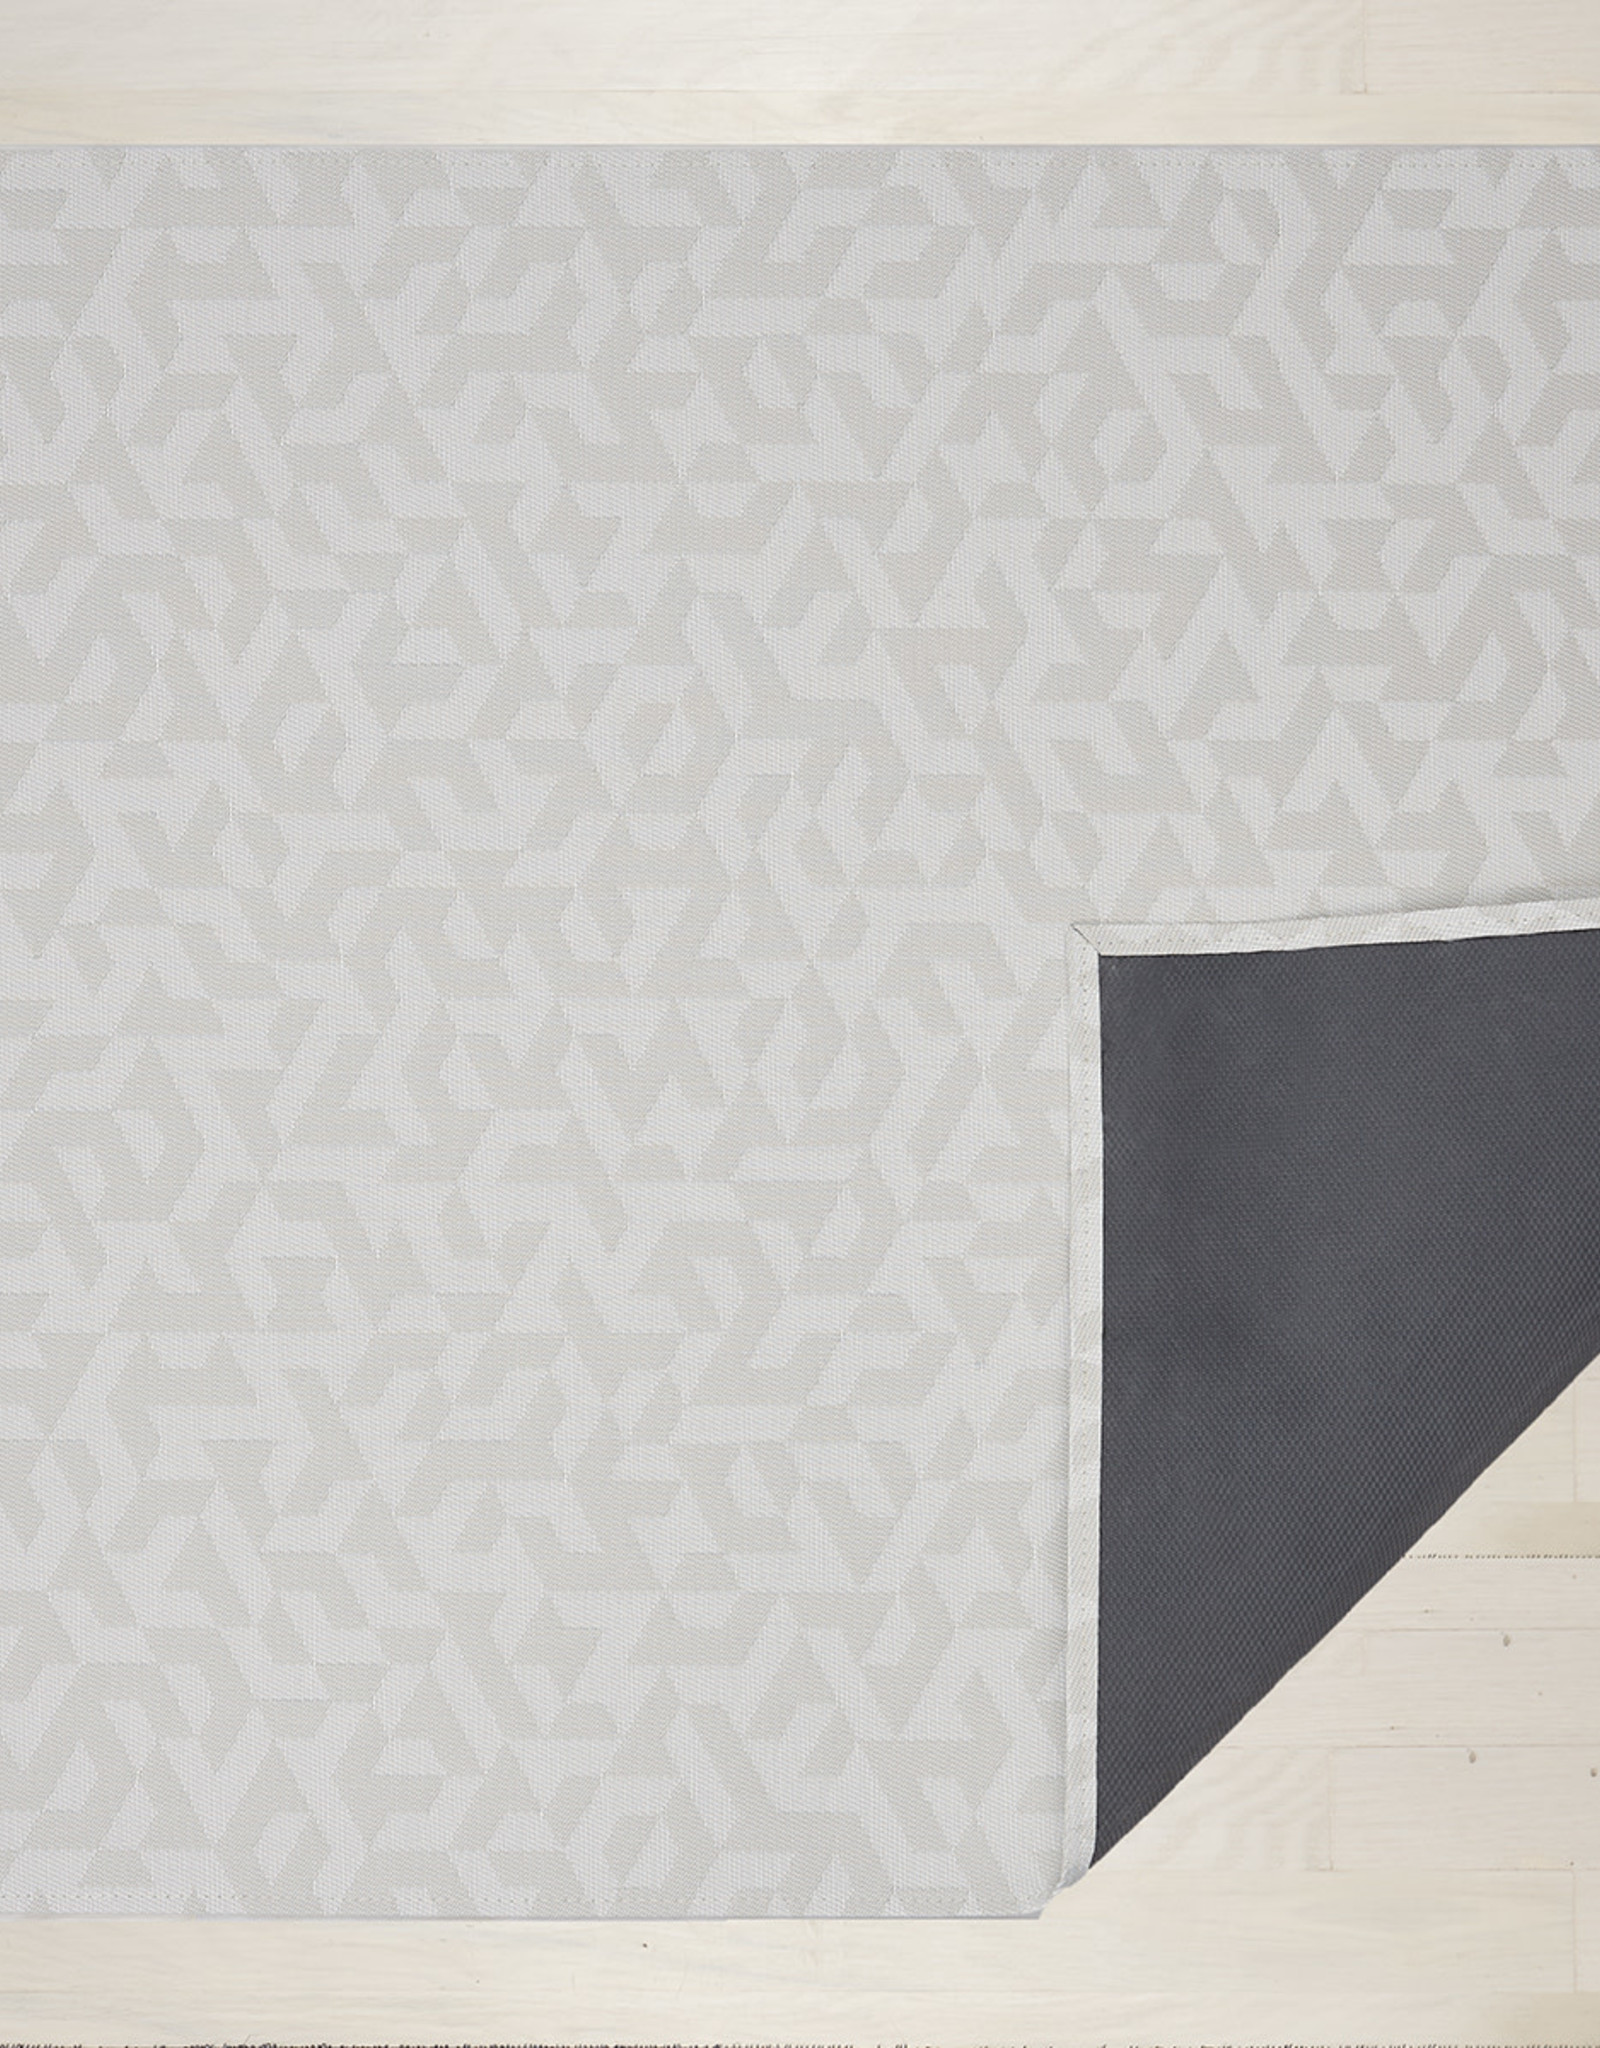 Chilewich Prism Floormat 72 x 106, NATURAL